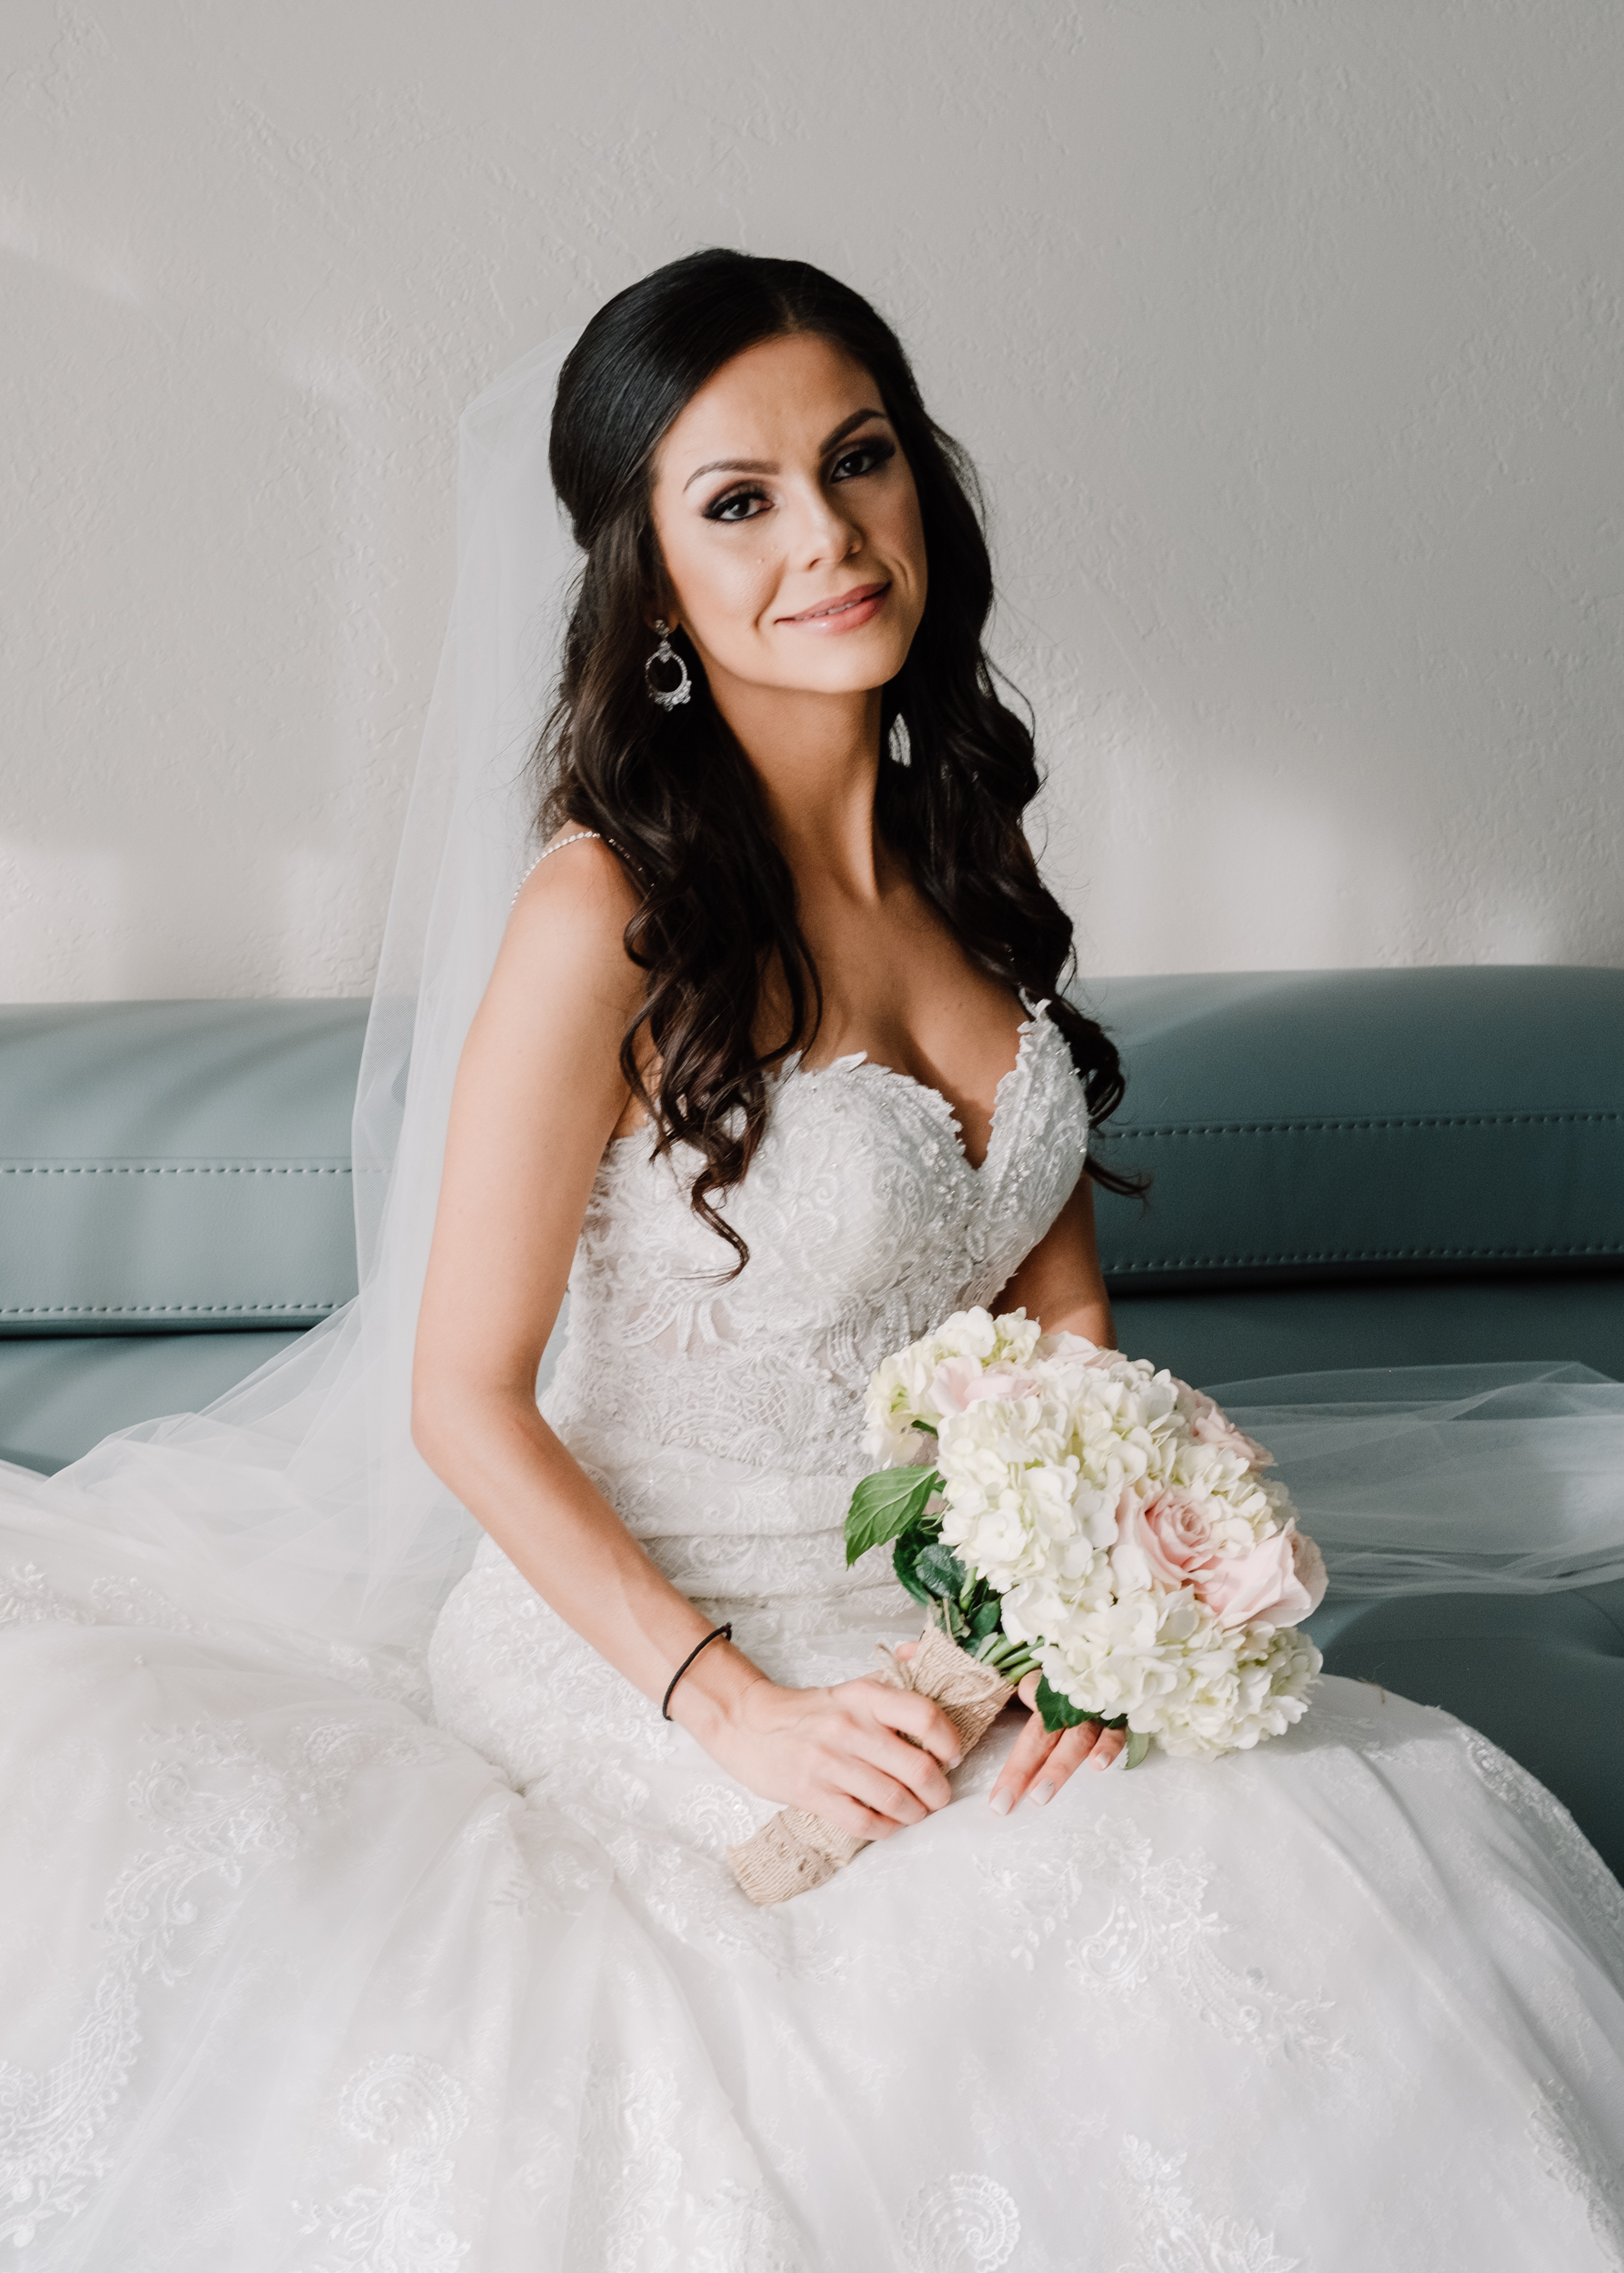 Amethyst Weddings - Georgi and Mariana 038.jpg